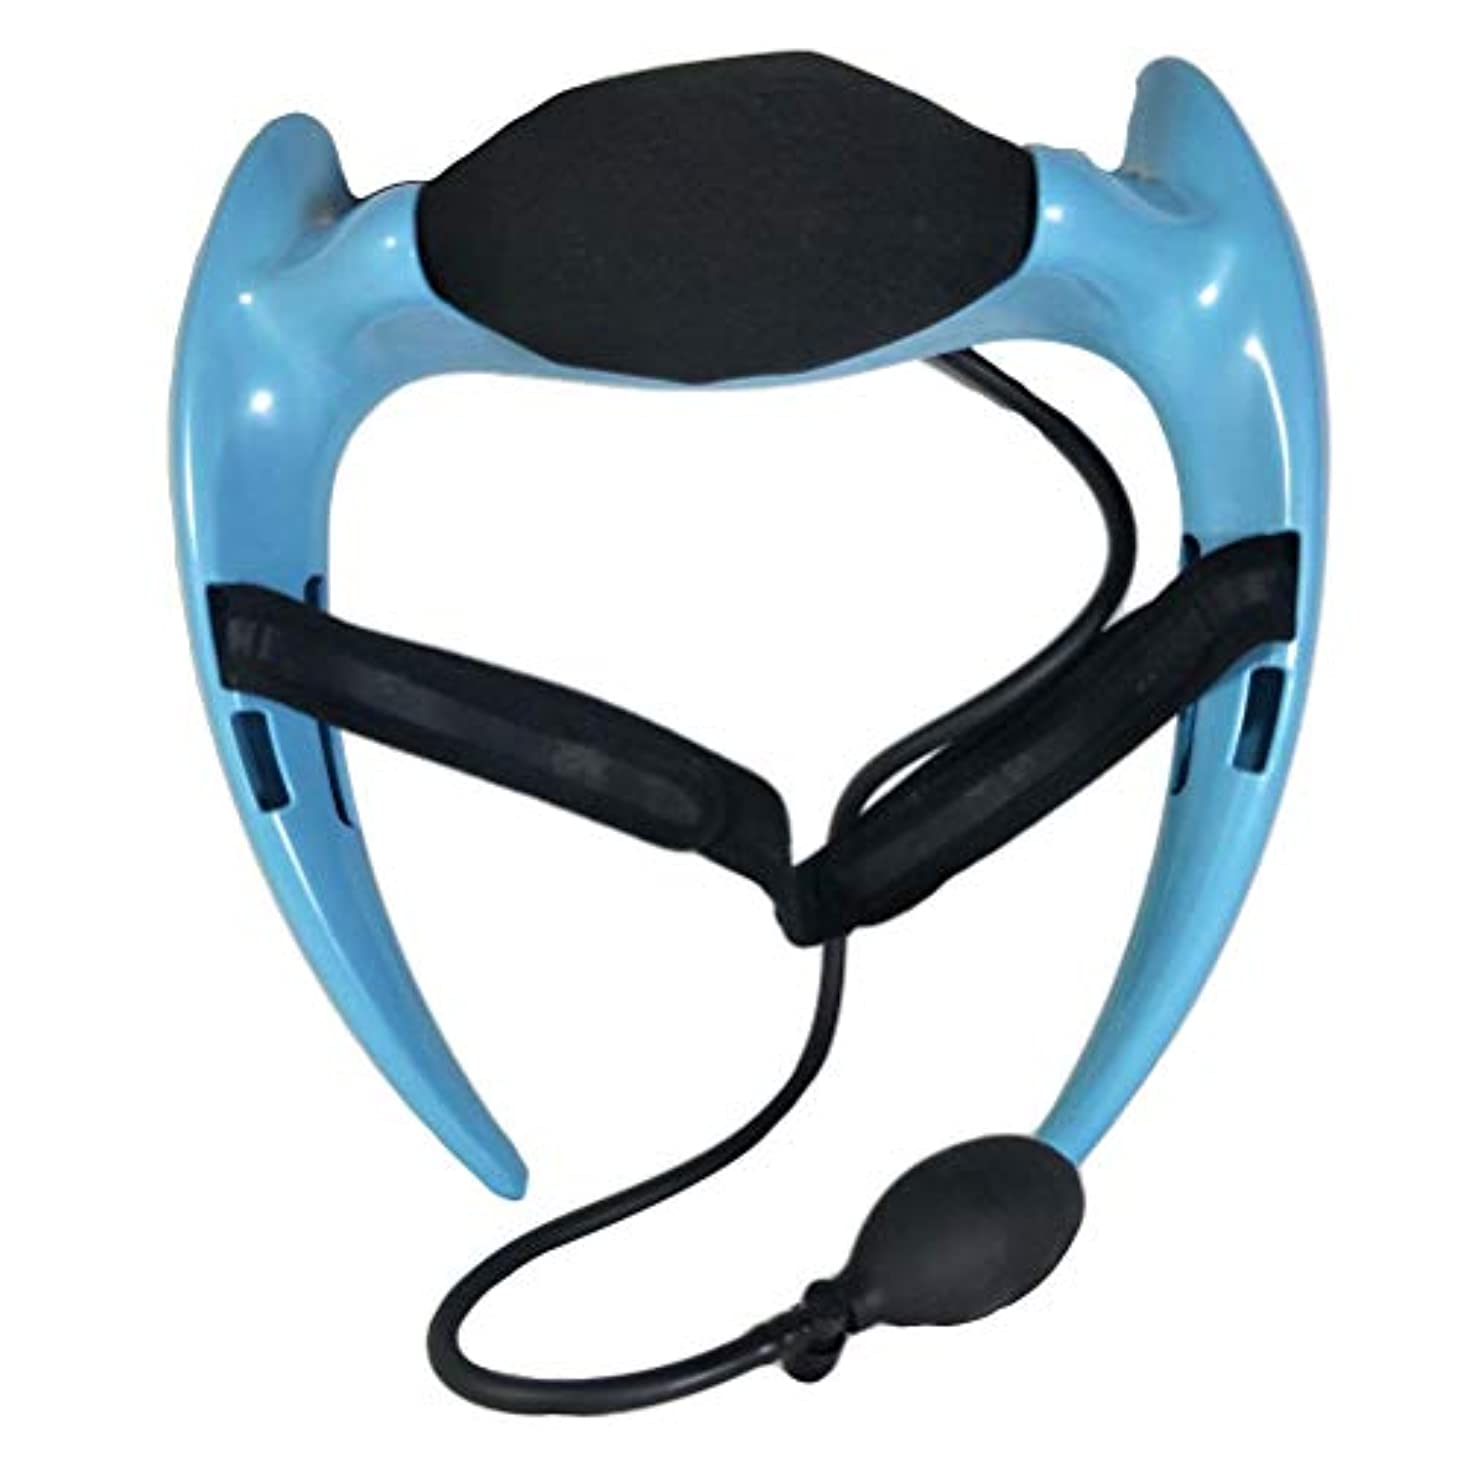 Healifty 首のけん引力調節可能な通気性の首サポートブレースネック首の首の襟首の首の痛みを和らげるリハビリ傷害回復(ブルー)